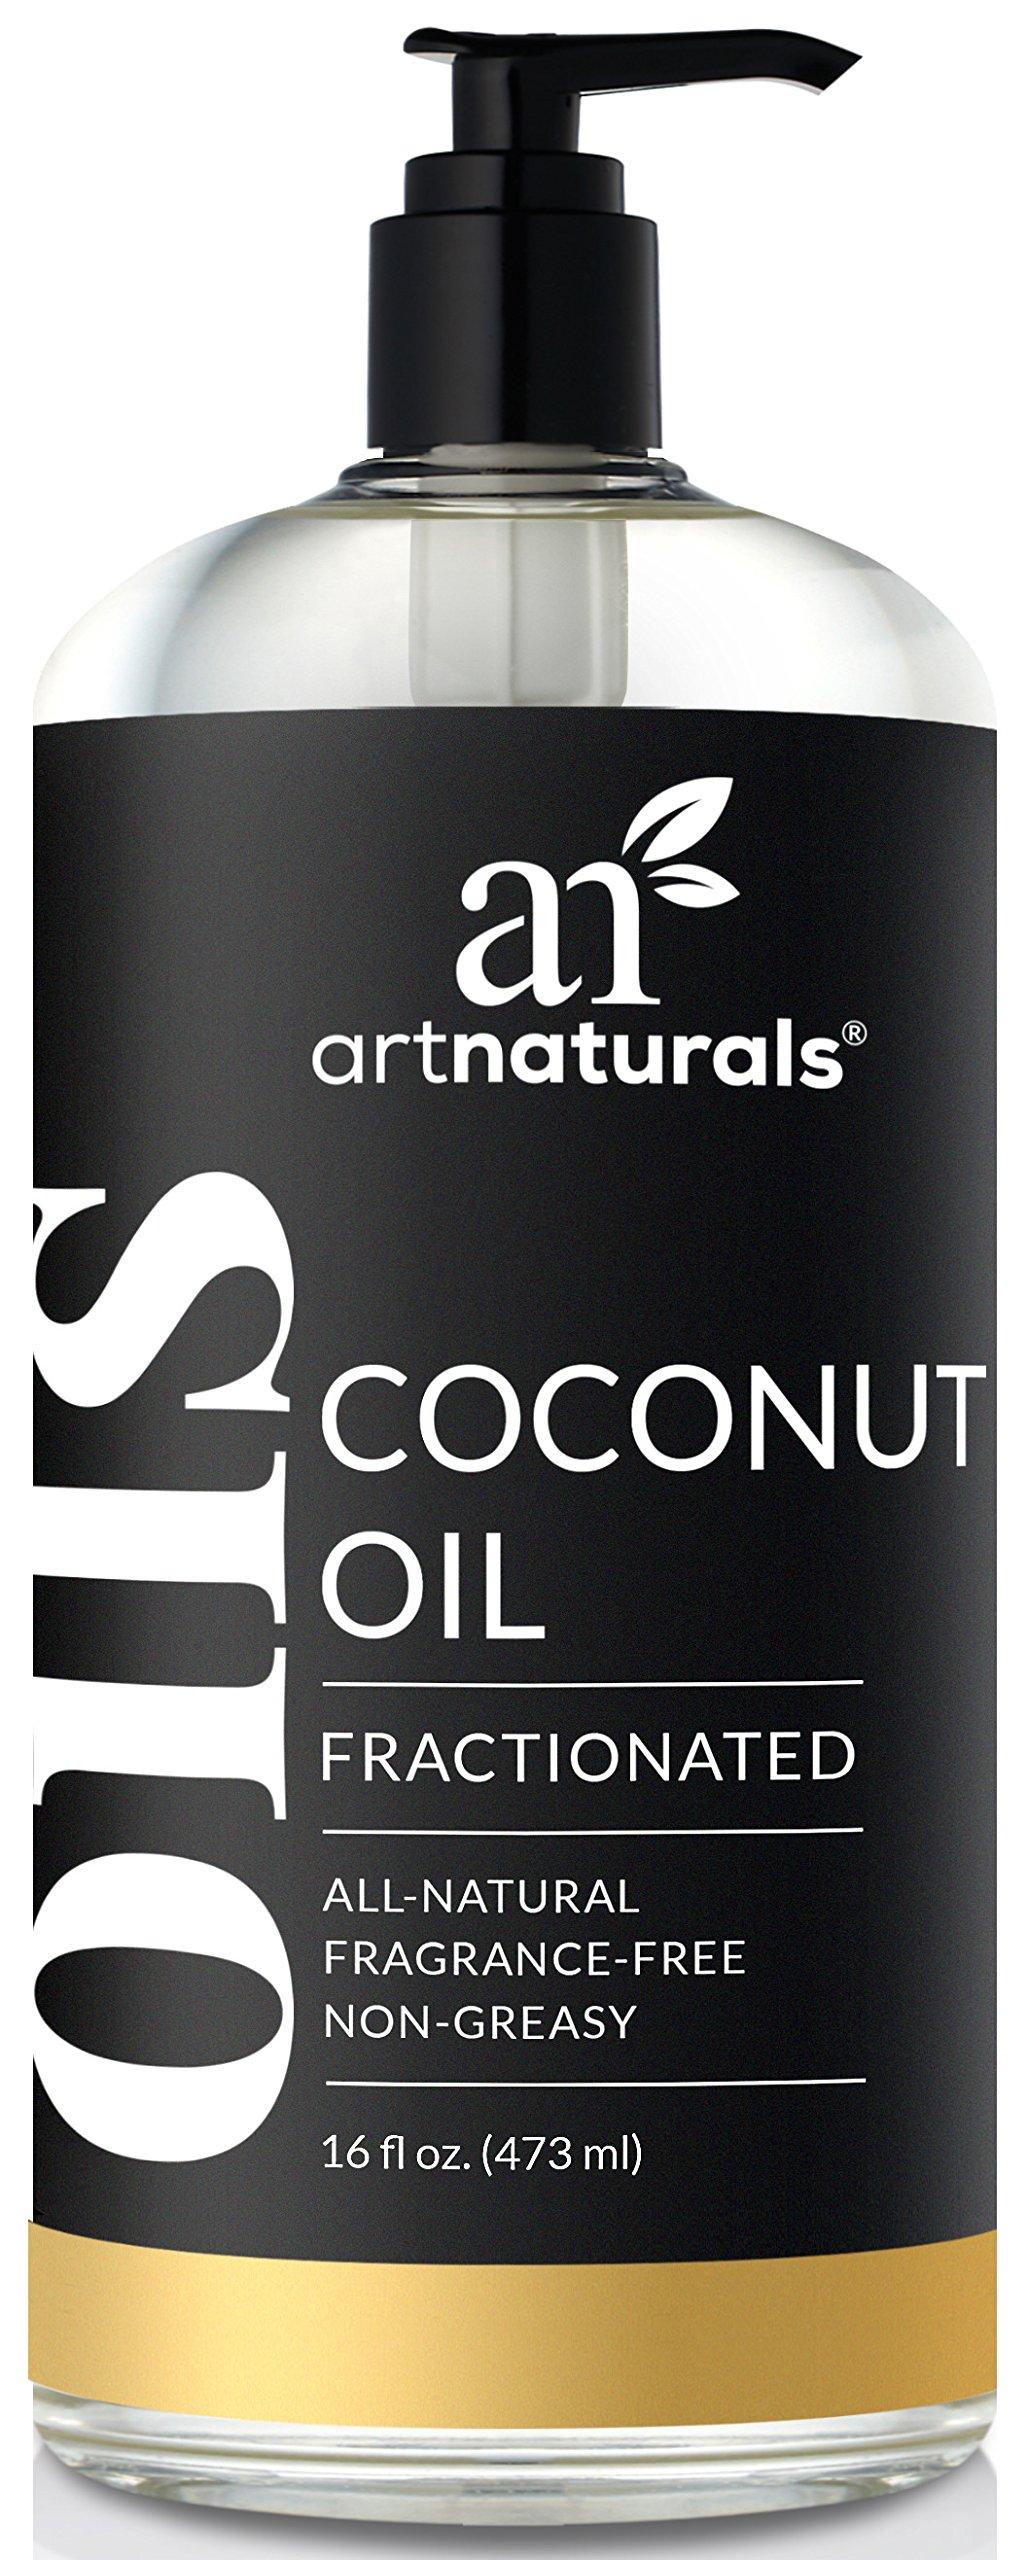 ArtNaturals 100% Natural Organic Pure Fractionated Coconut Oil Liquid for skin - 16 Oz Premium Therapeutic Grade - Coconut Massage Oil and Carrier Oil for Essential Oils